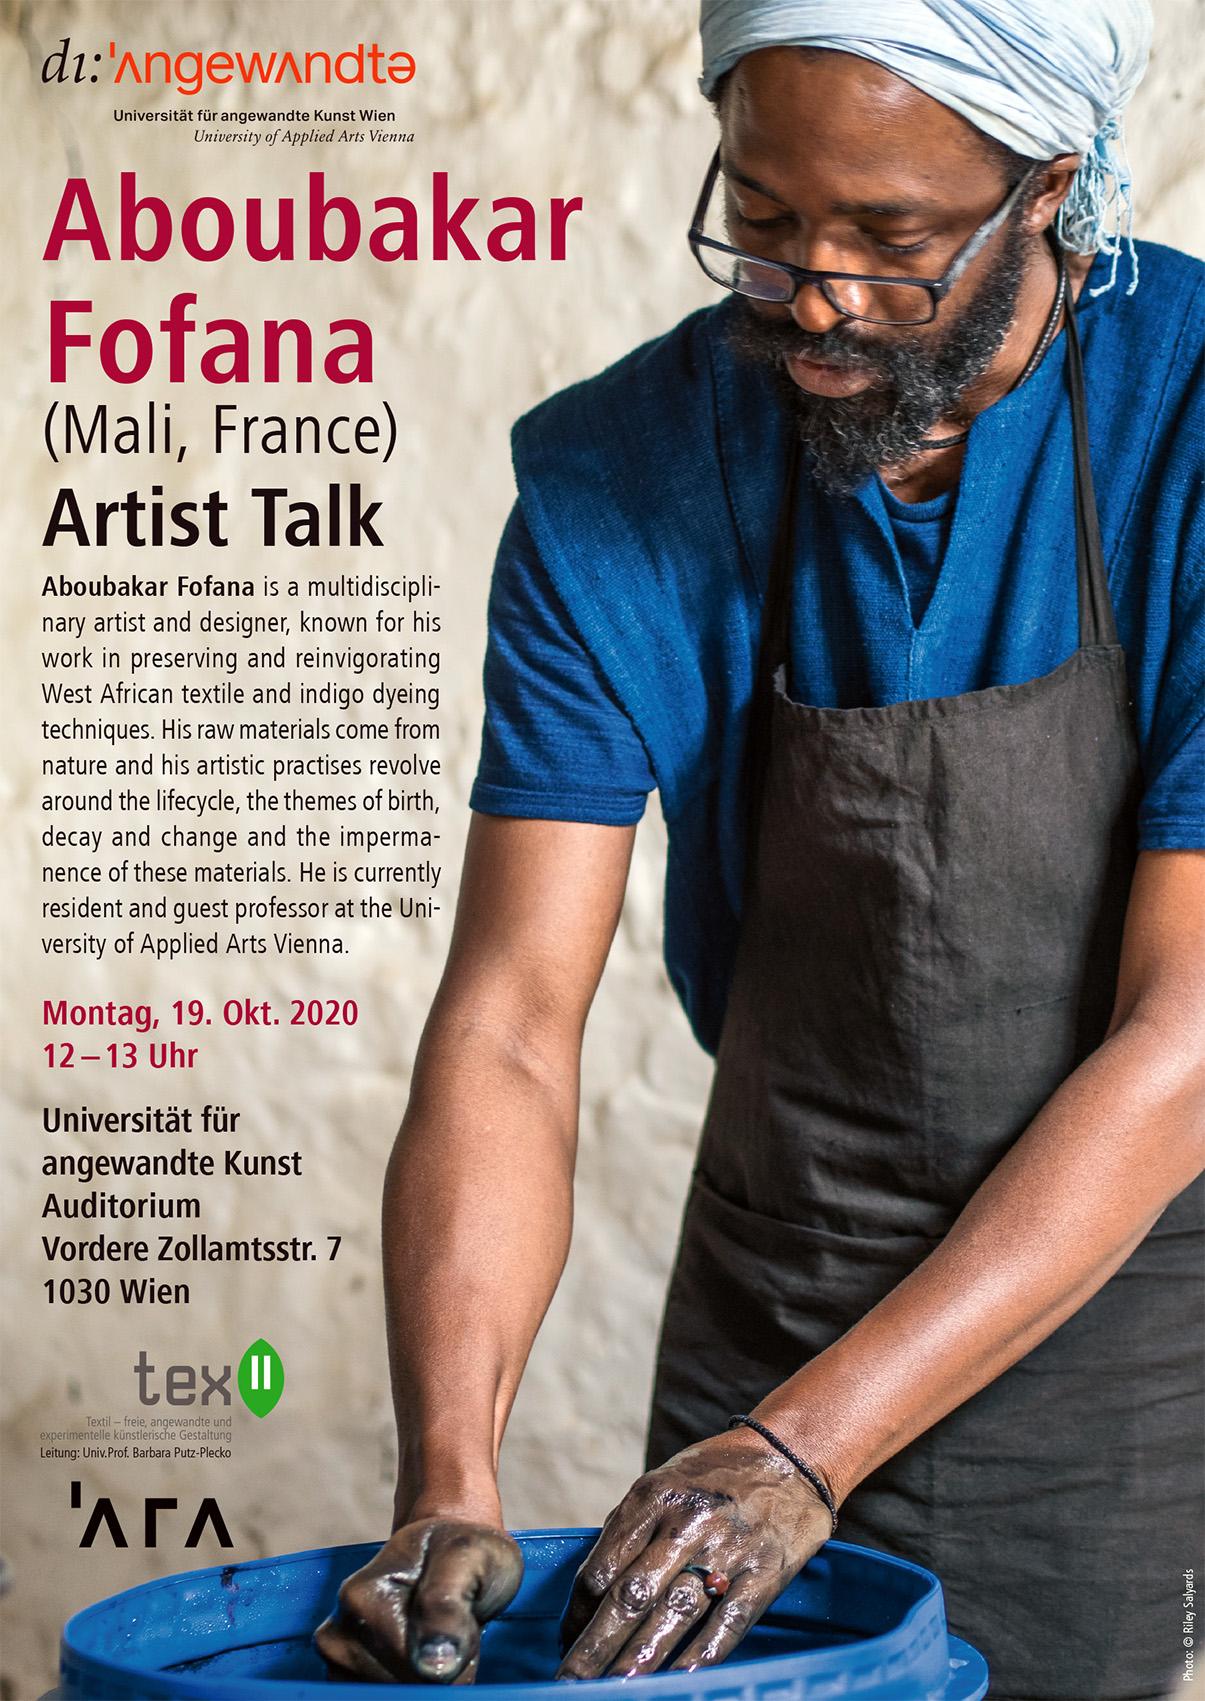 Artist Talk with Aboubakar Fofana